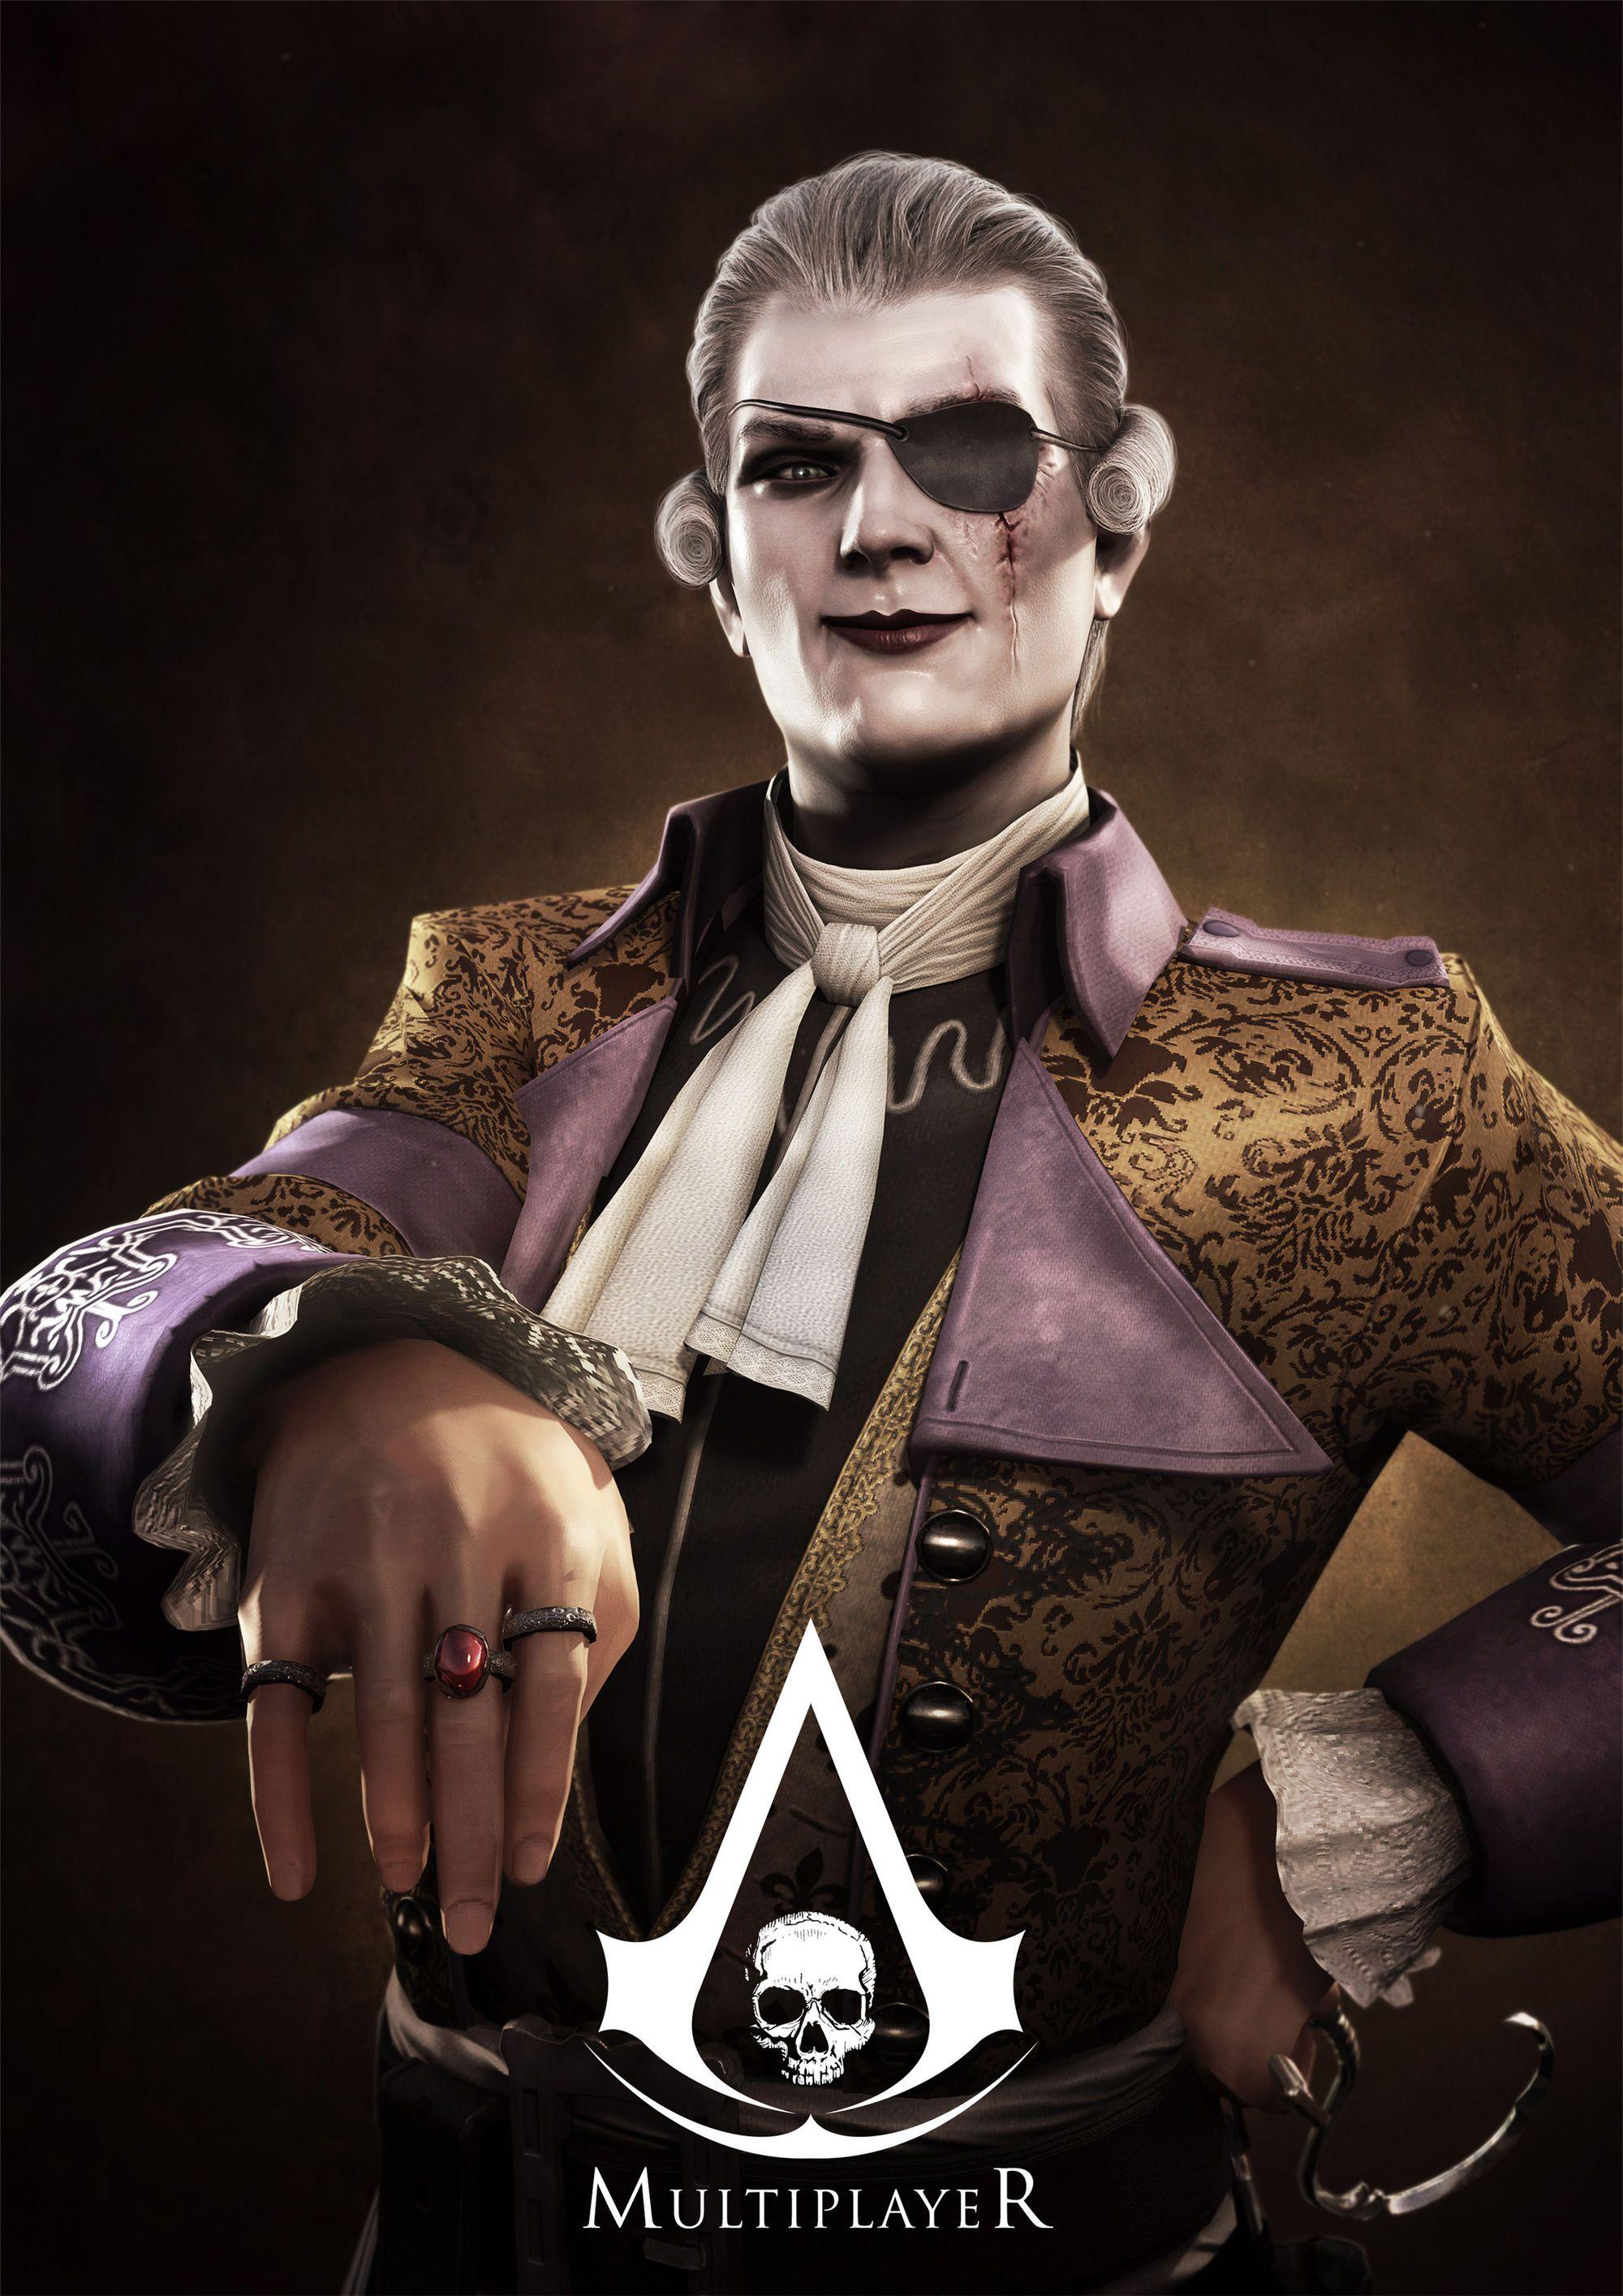 Image Result For Assassin S Creed Black Flag Online Characters Assassins Creed Black Flag Assassins Creed 4 Assassins Creed